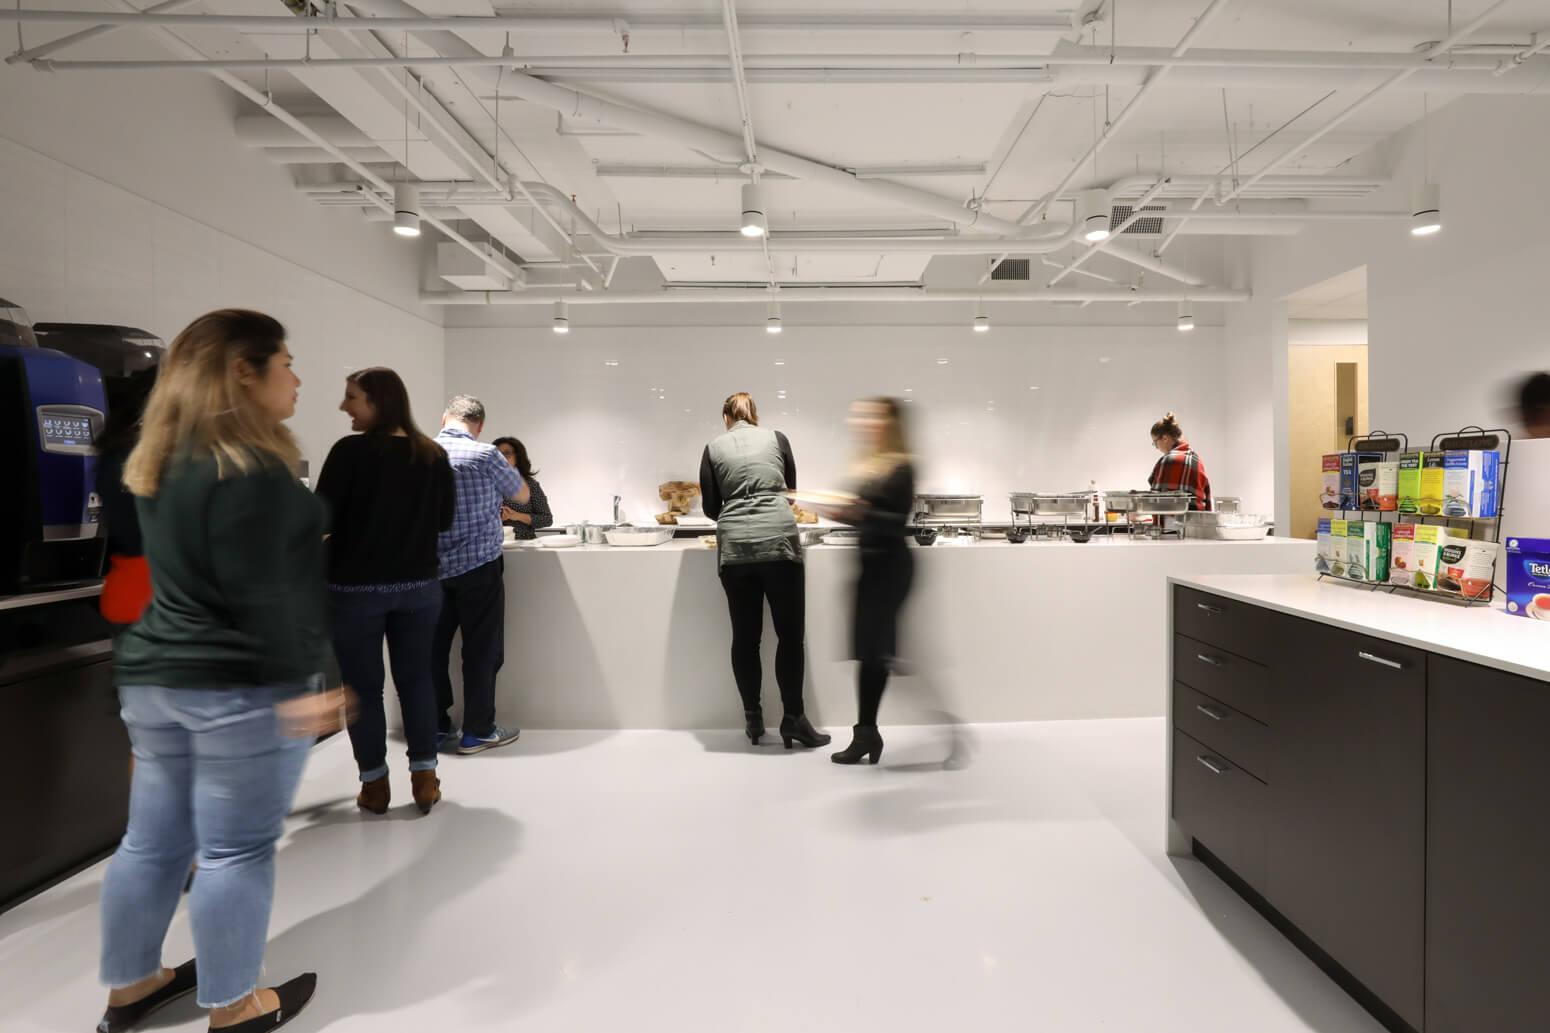 BlueCat-Toronto-KillerSpaces-Techvibes-12